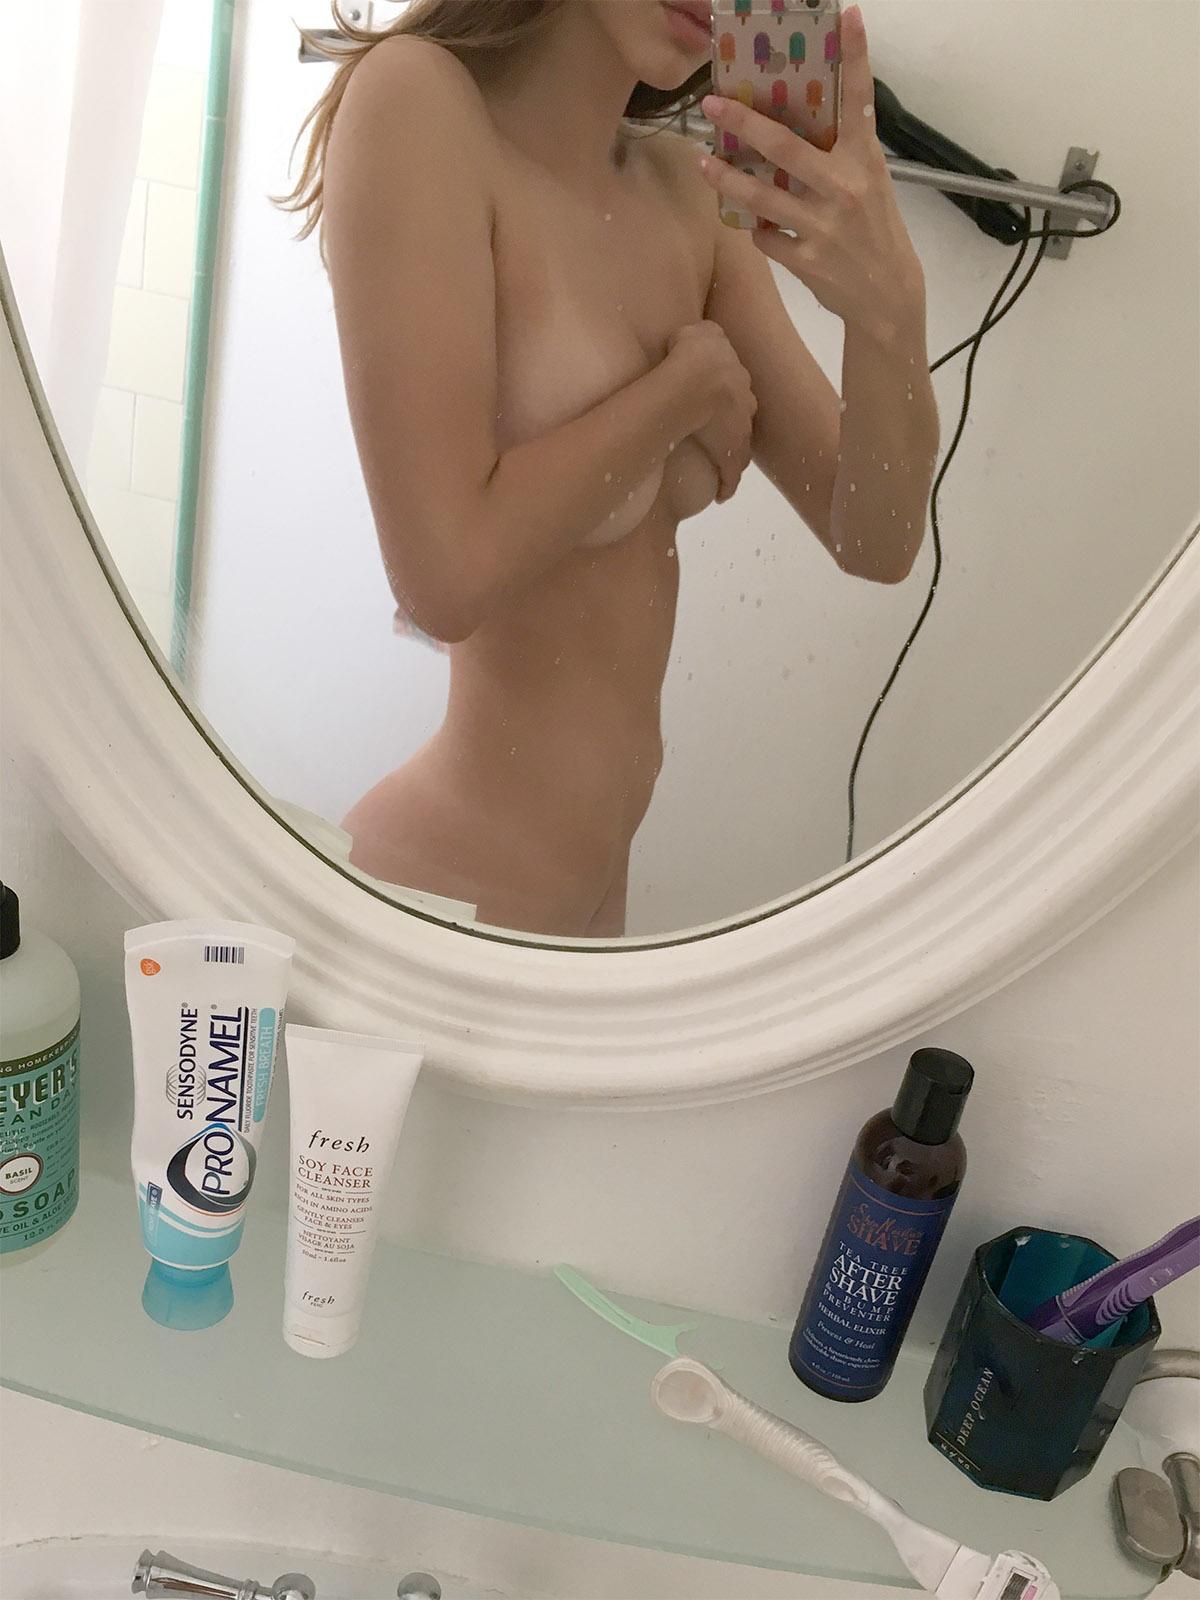 Celine Farach Nude Photos Leaked The Fappening